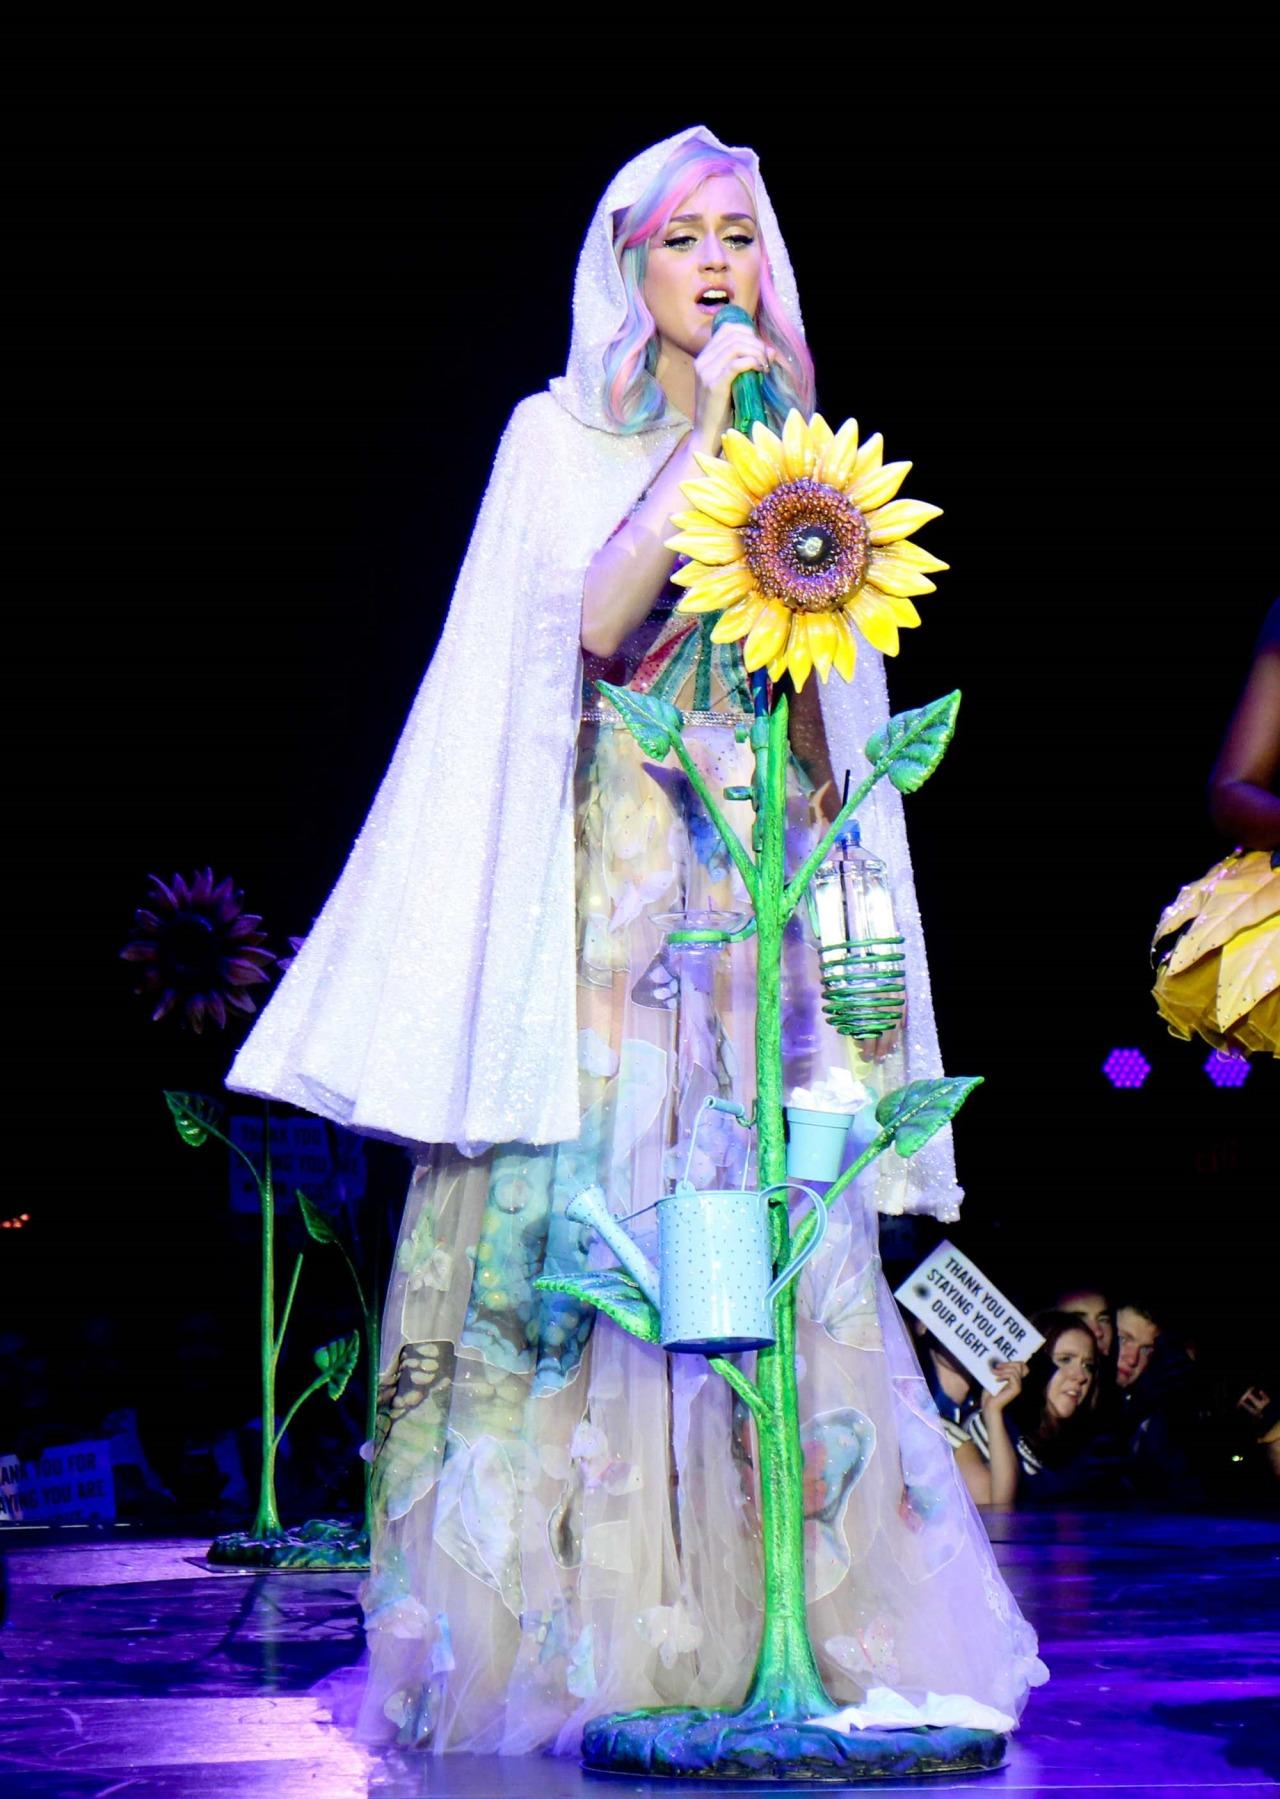 Katy Perry >> The Prismatic World Tour Tumblr_n58y1pycJY1qc70kwo9_1280